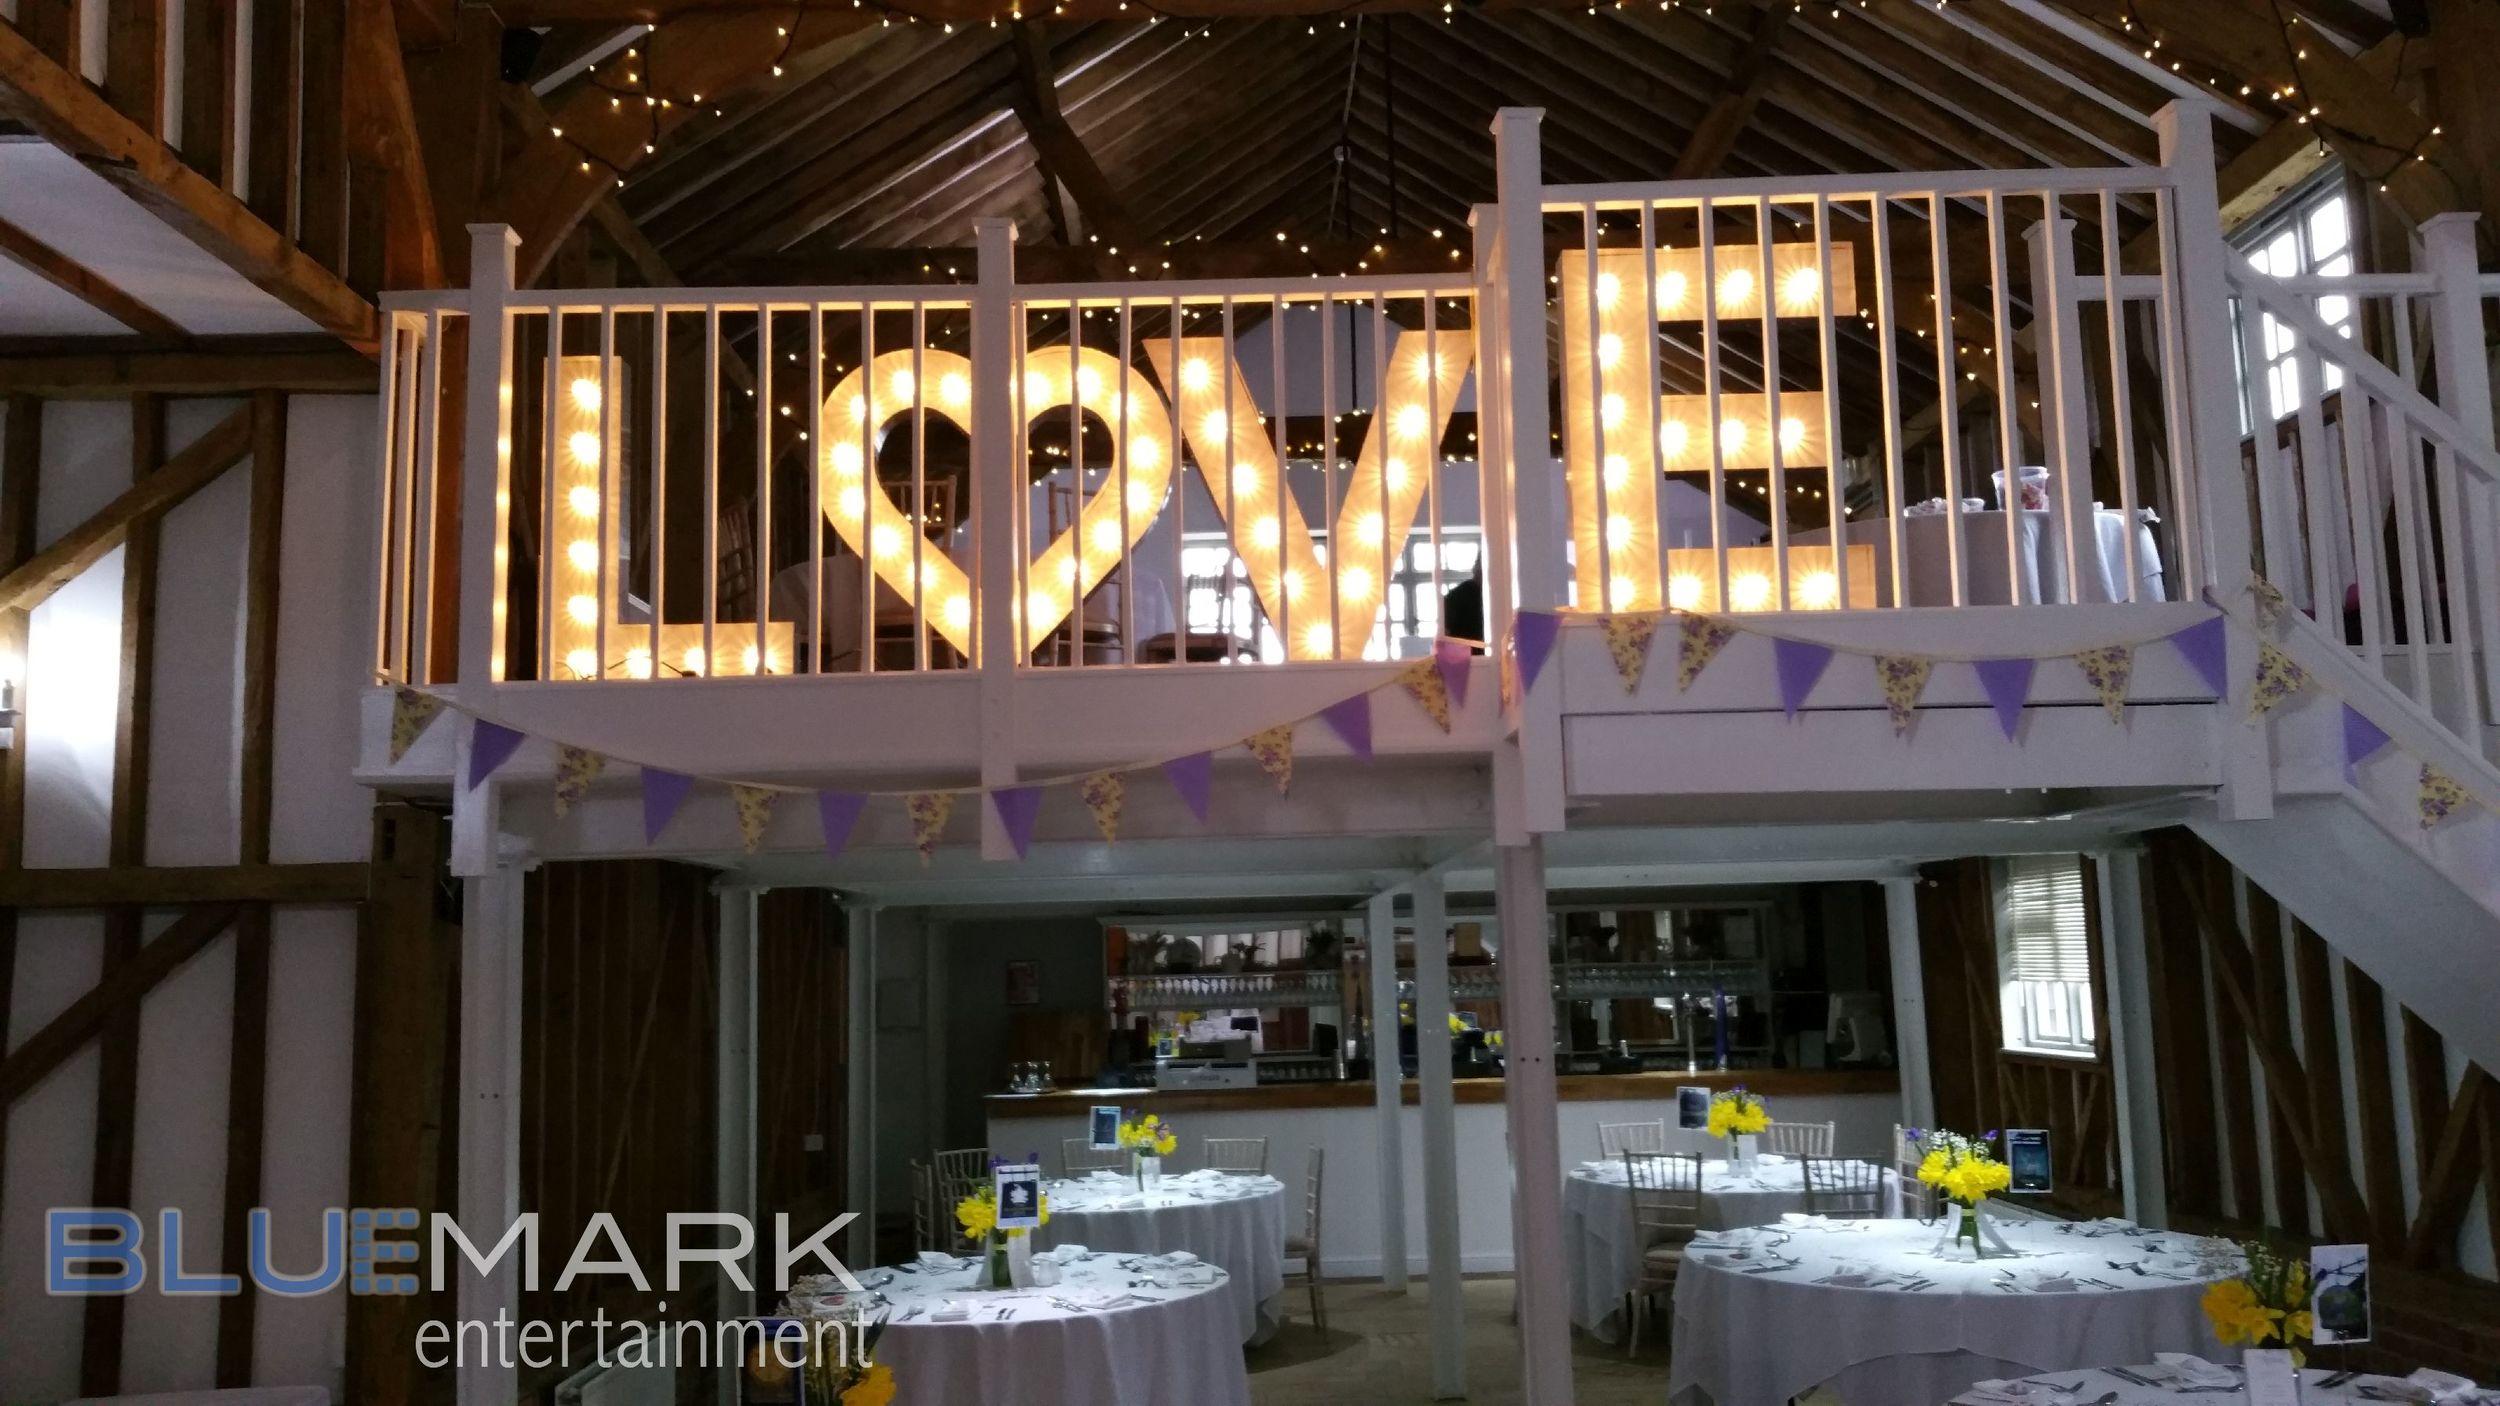 Bluemark Entertainment Engagement Party 2016-03-26 11.38.10.jpg